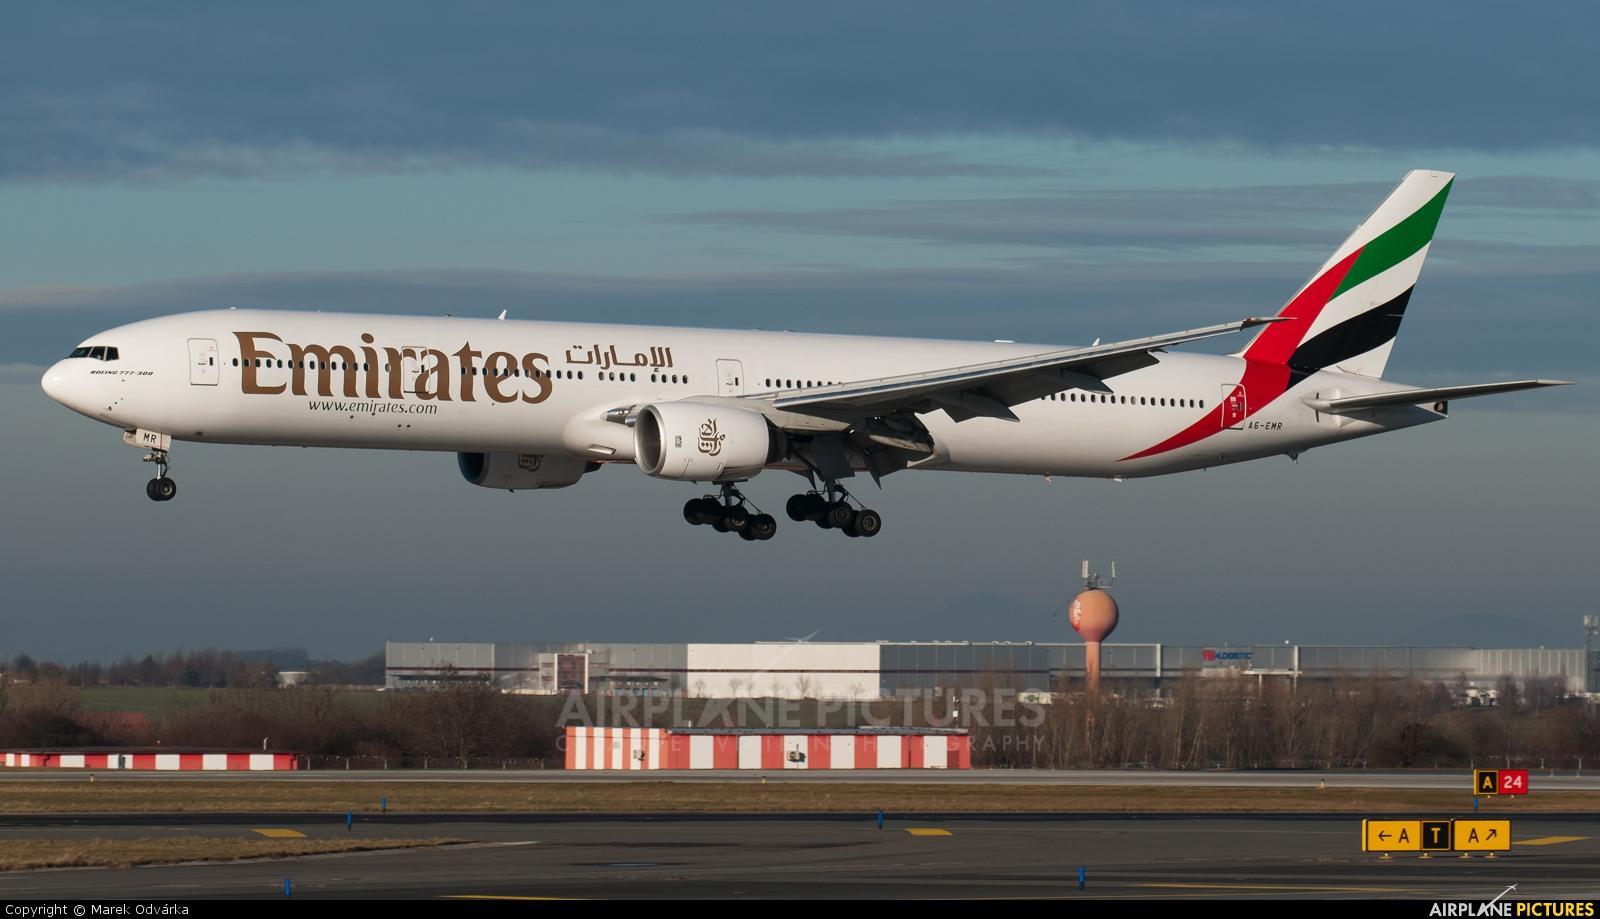 Emirates Airlines A6-EMR aircraft at Prague - Václav Havel